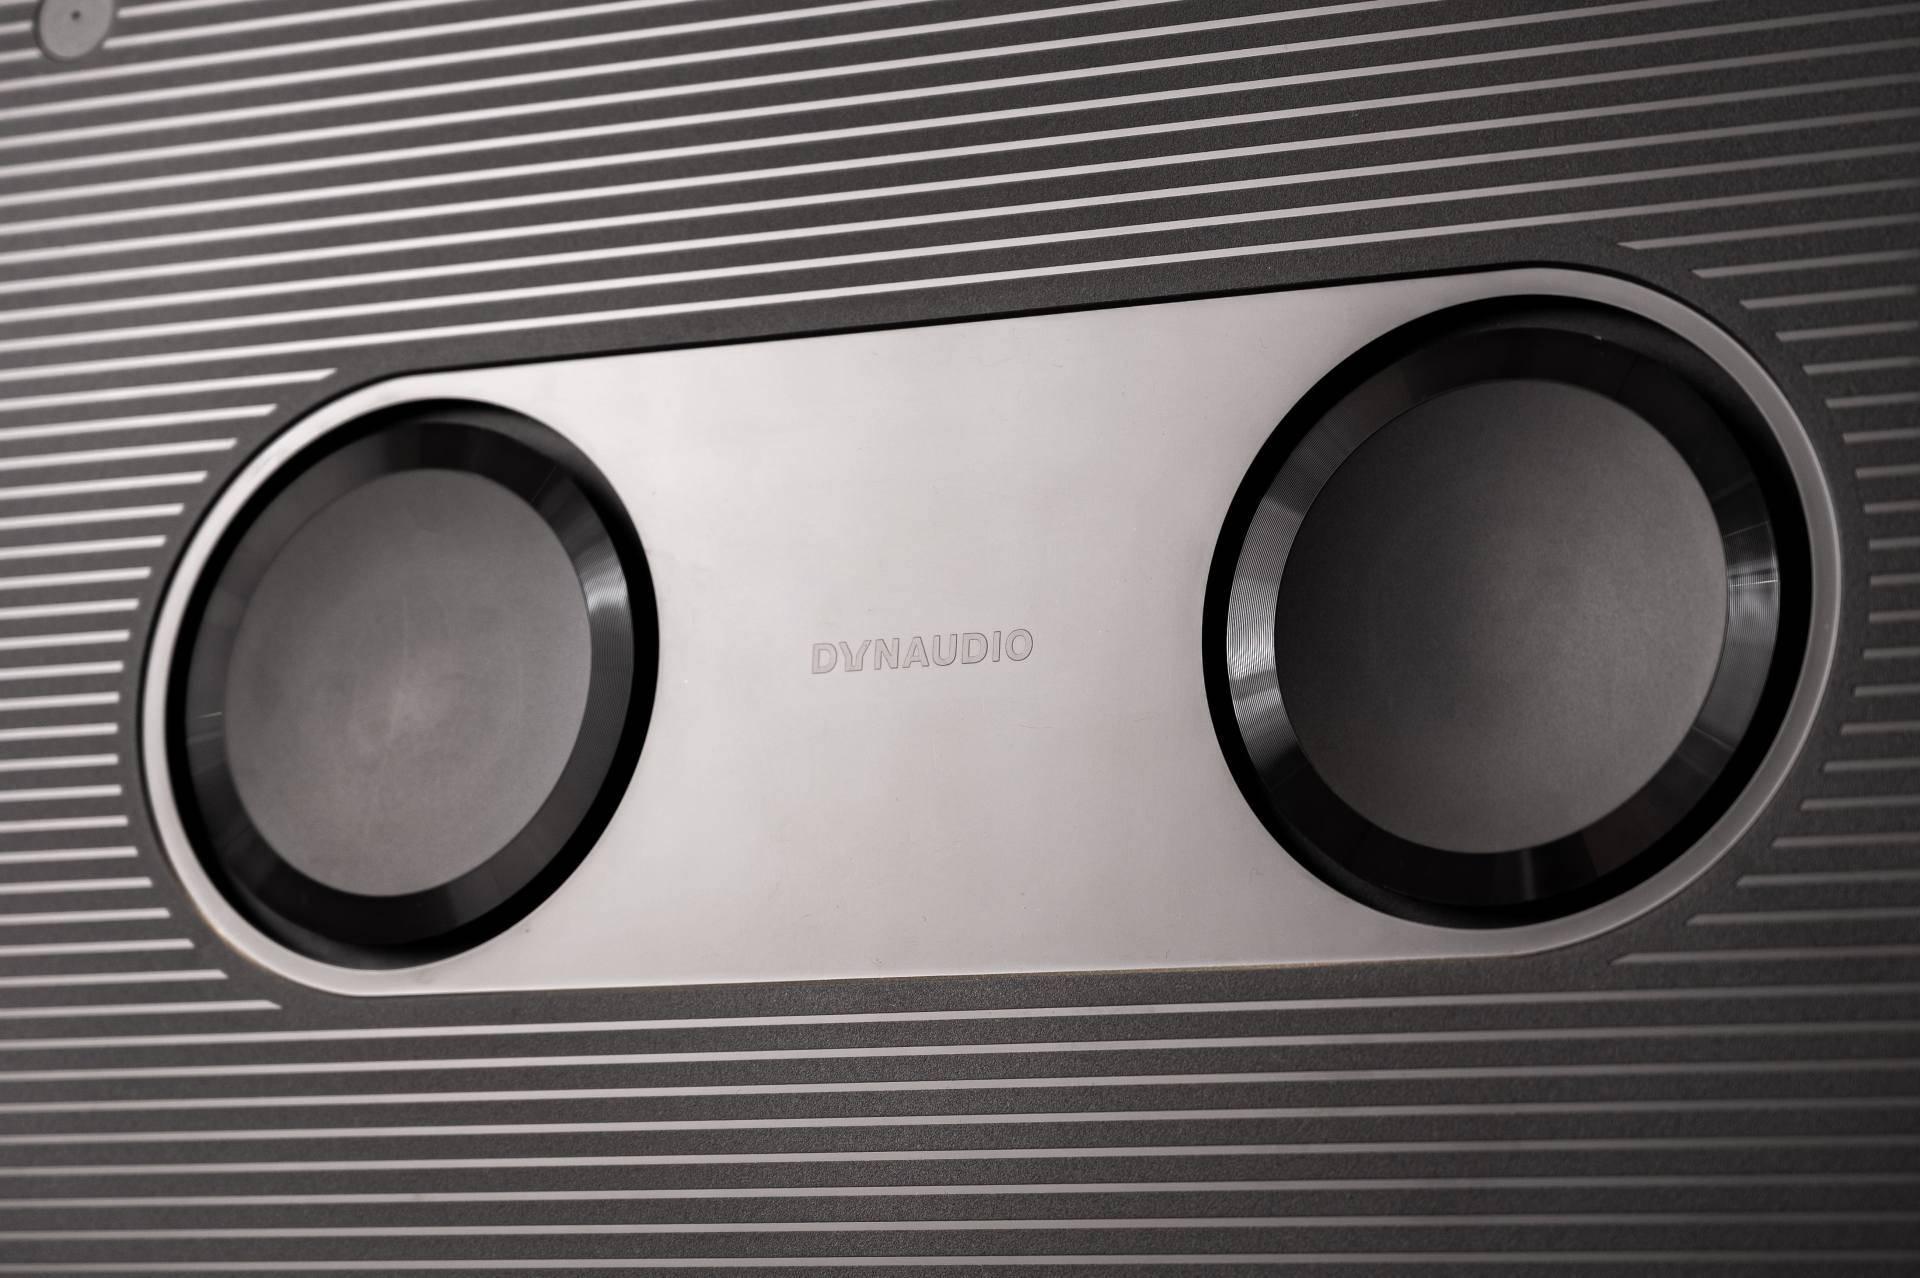 PS5国行版开售在即,你准备好买什么电视了吗?